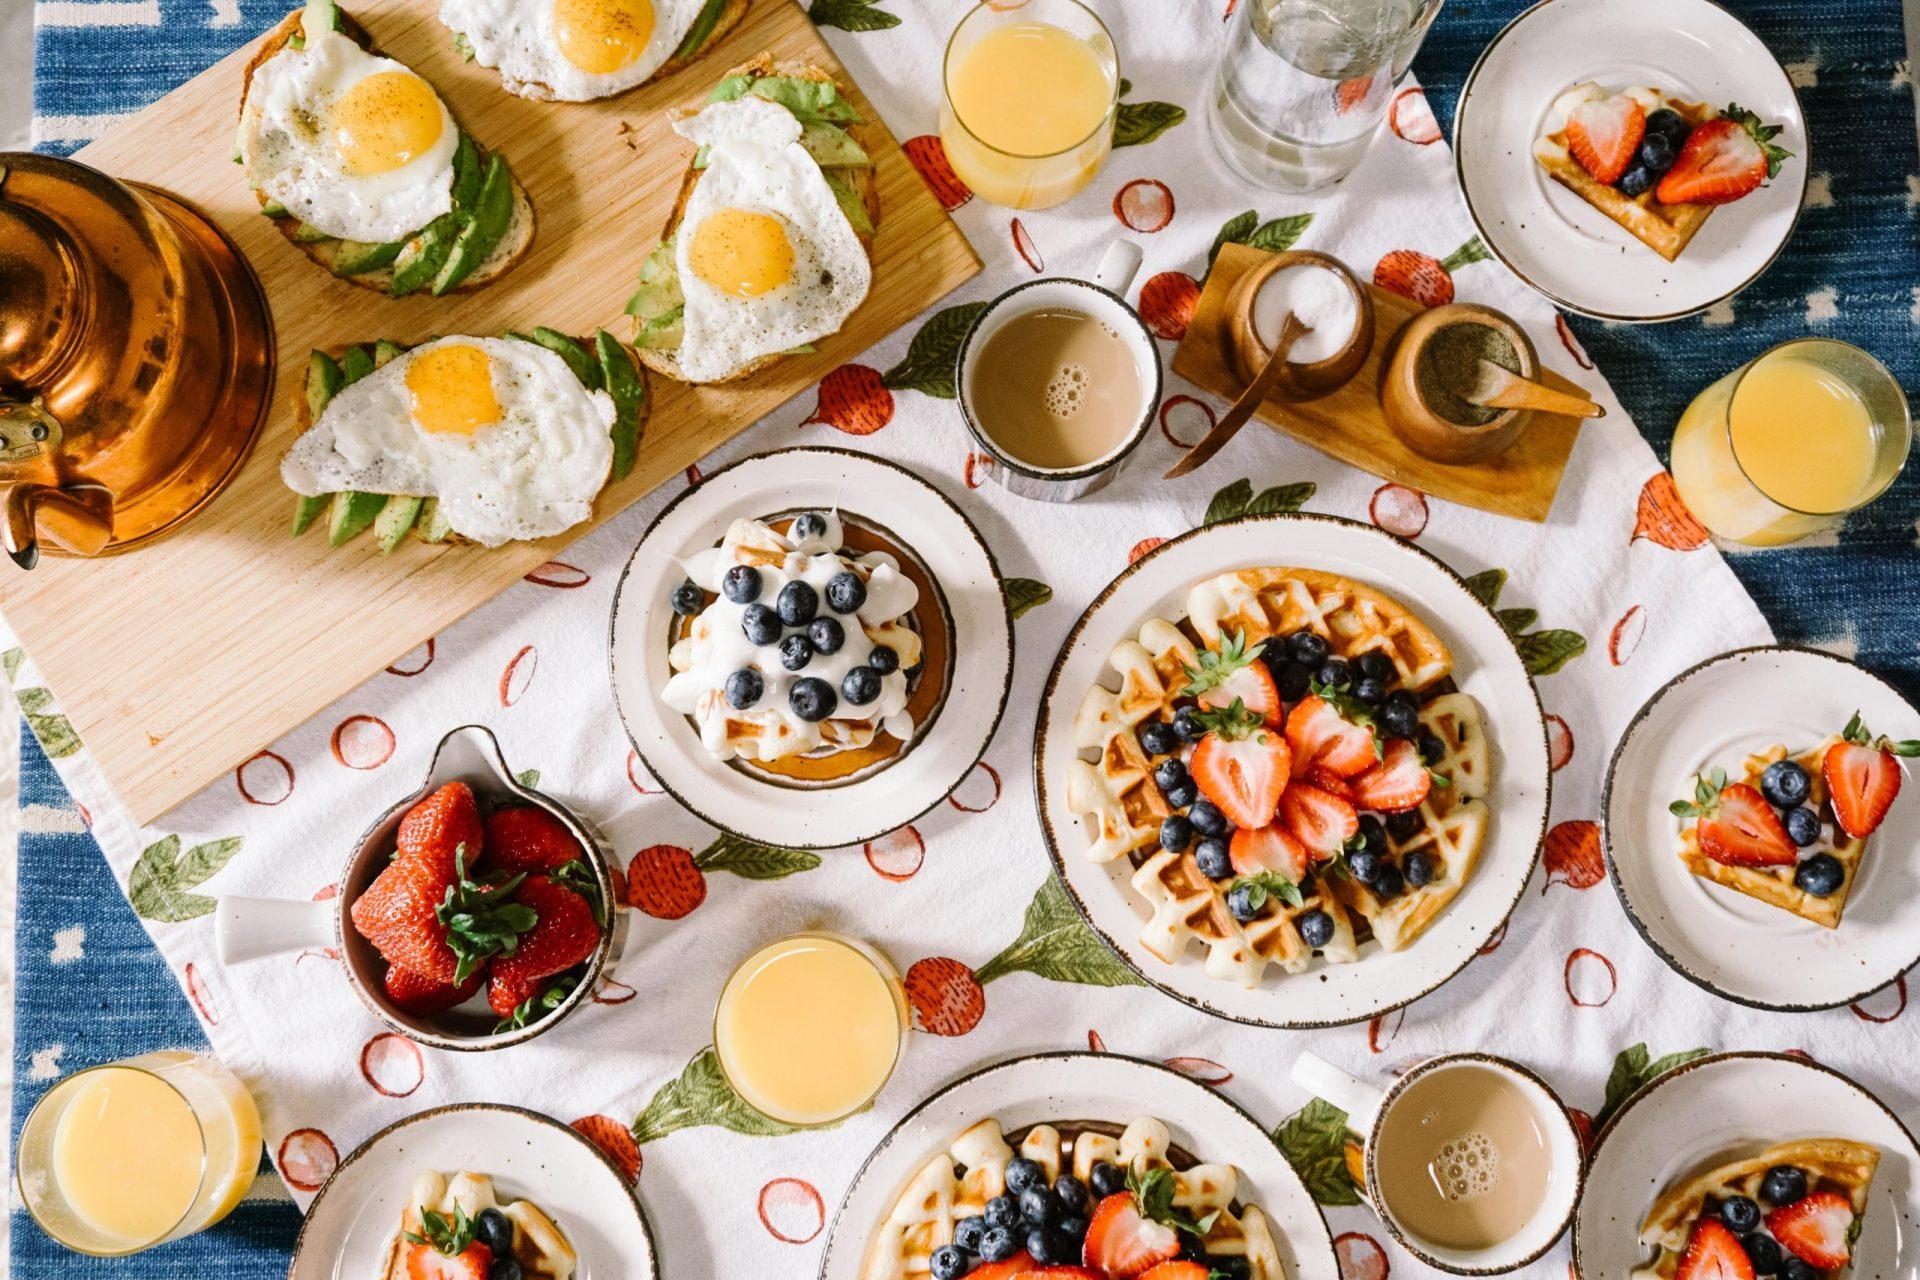 breakfast scaled - Home